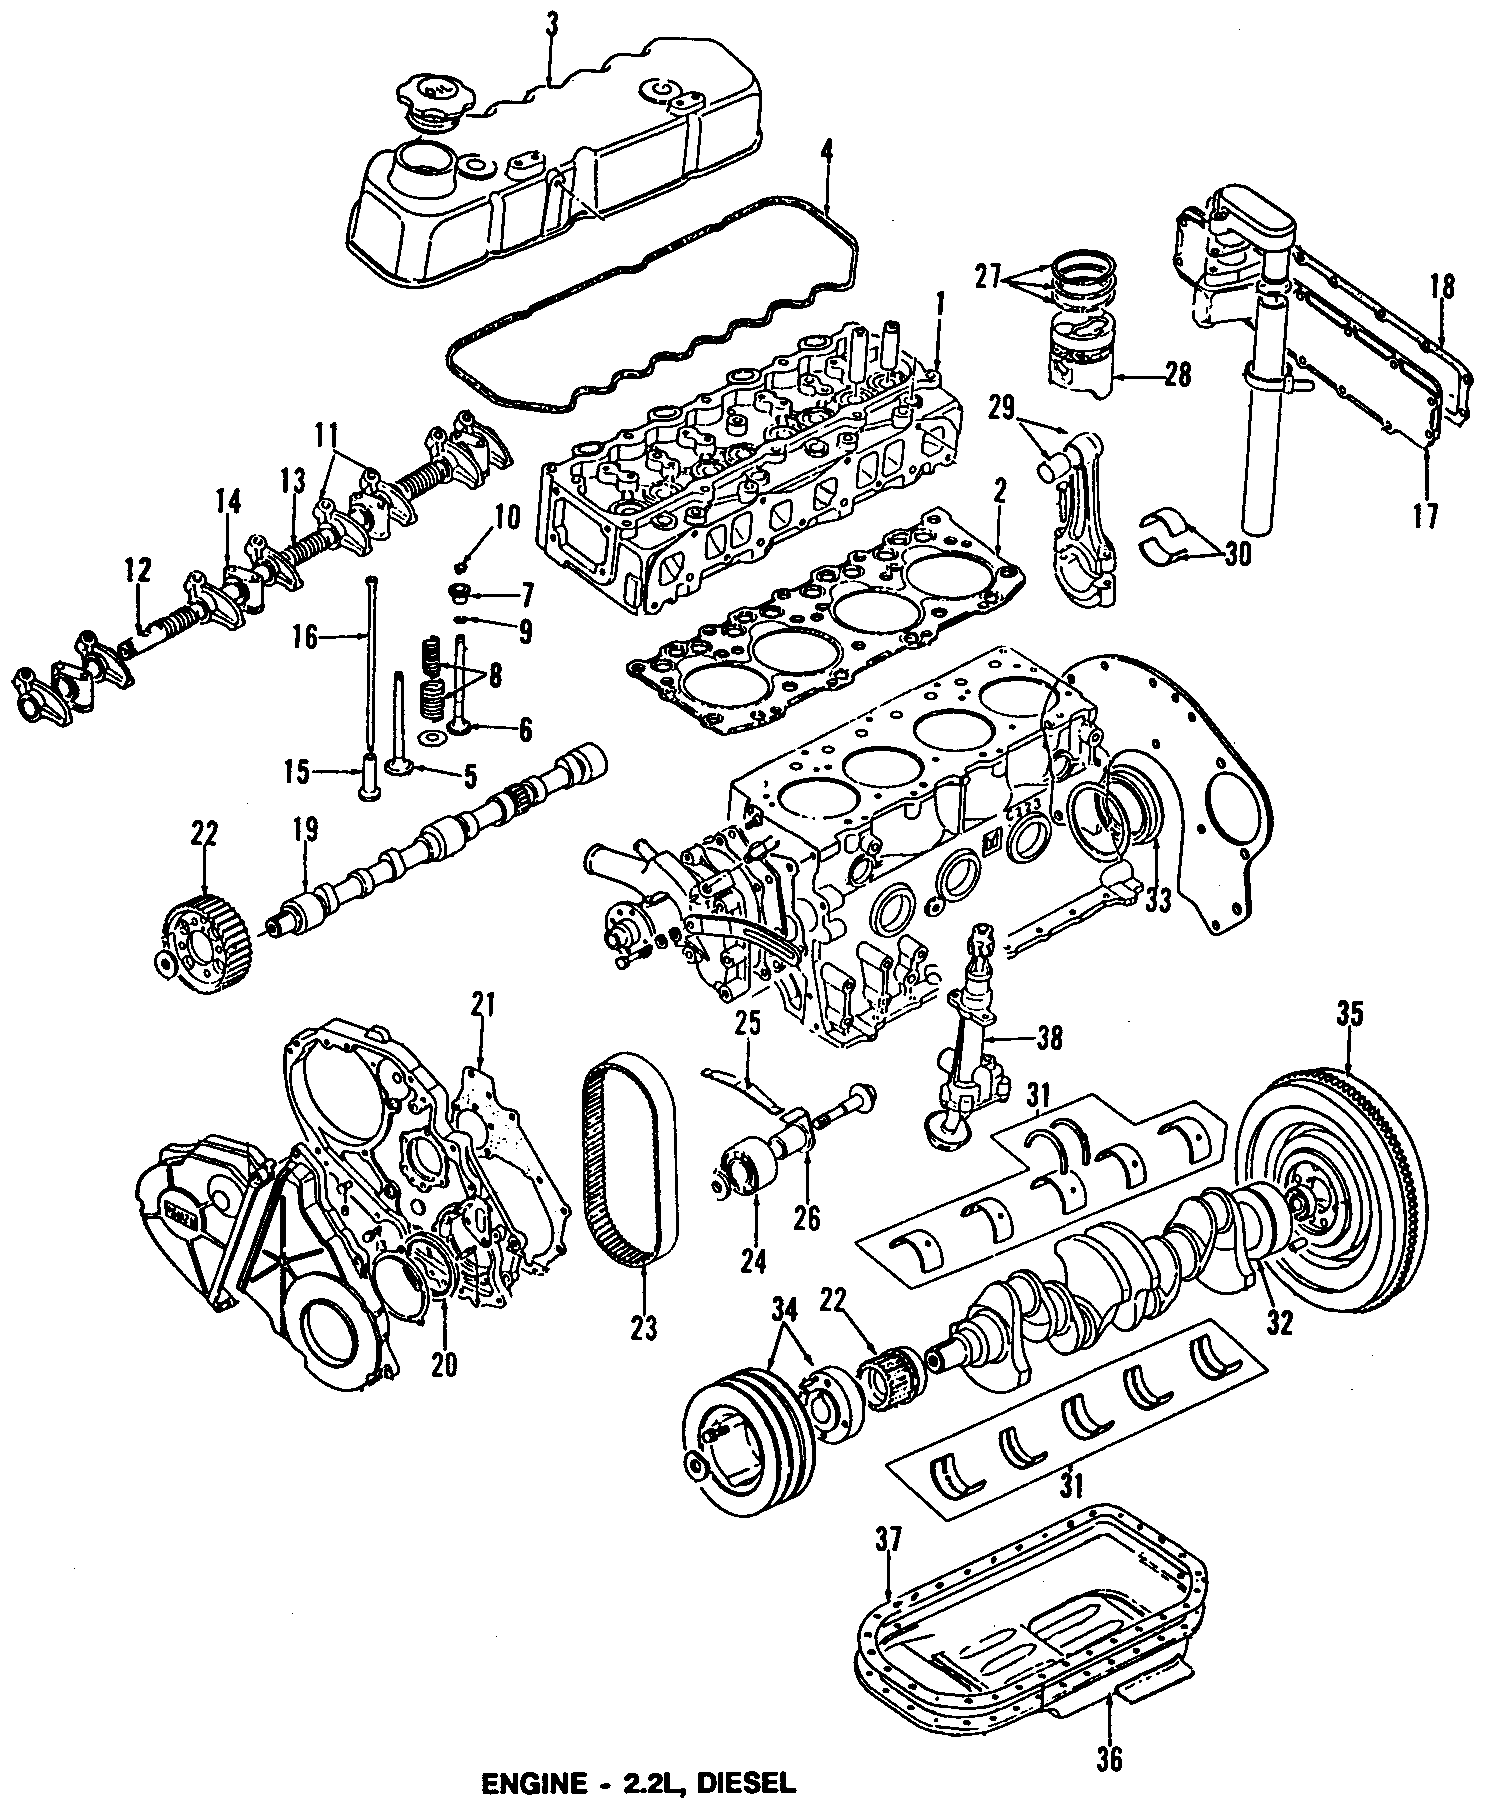 Chevrolet S10 Engine Timing Cover Gasket  2 2 Liter Diesel